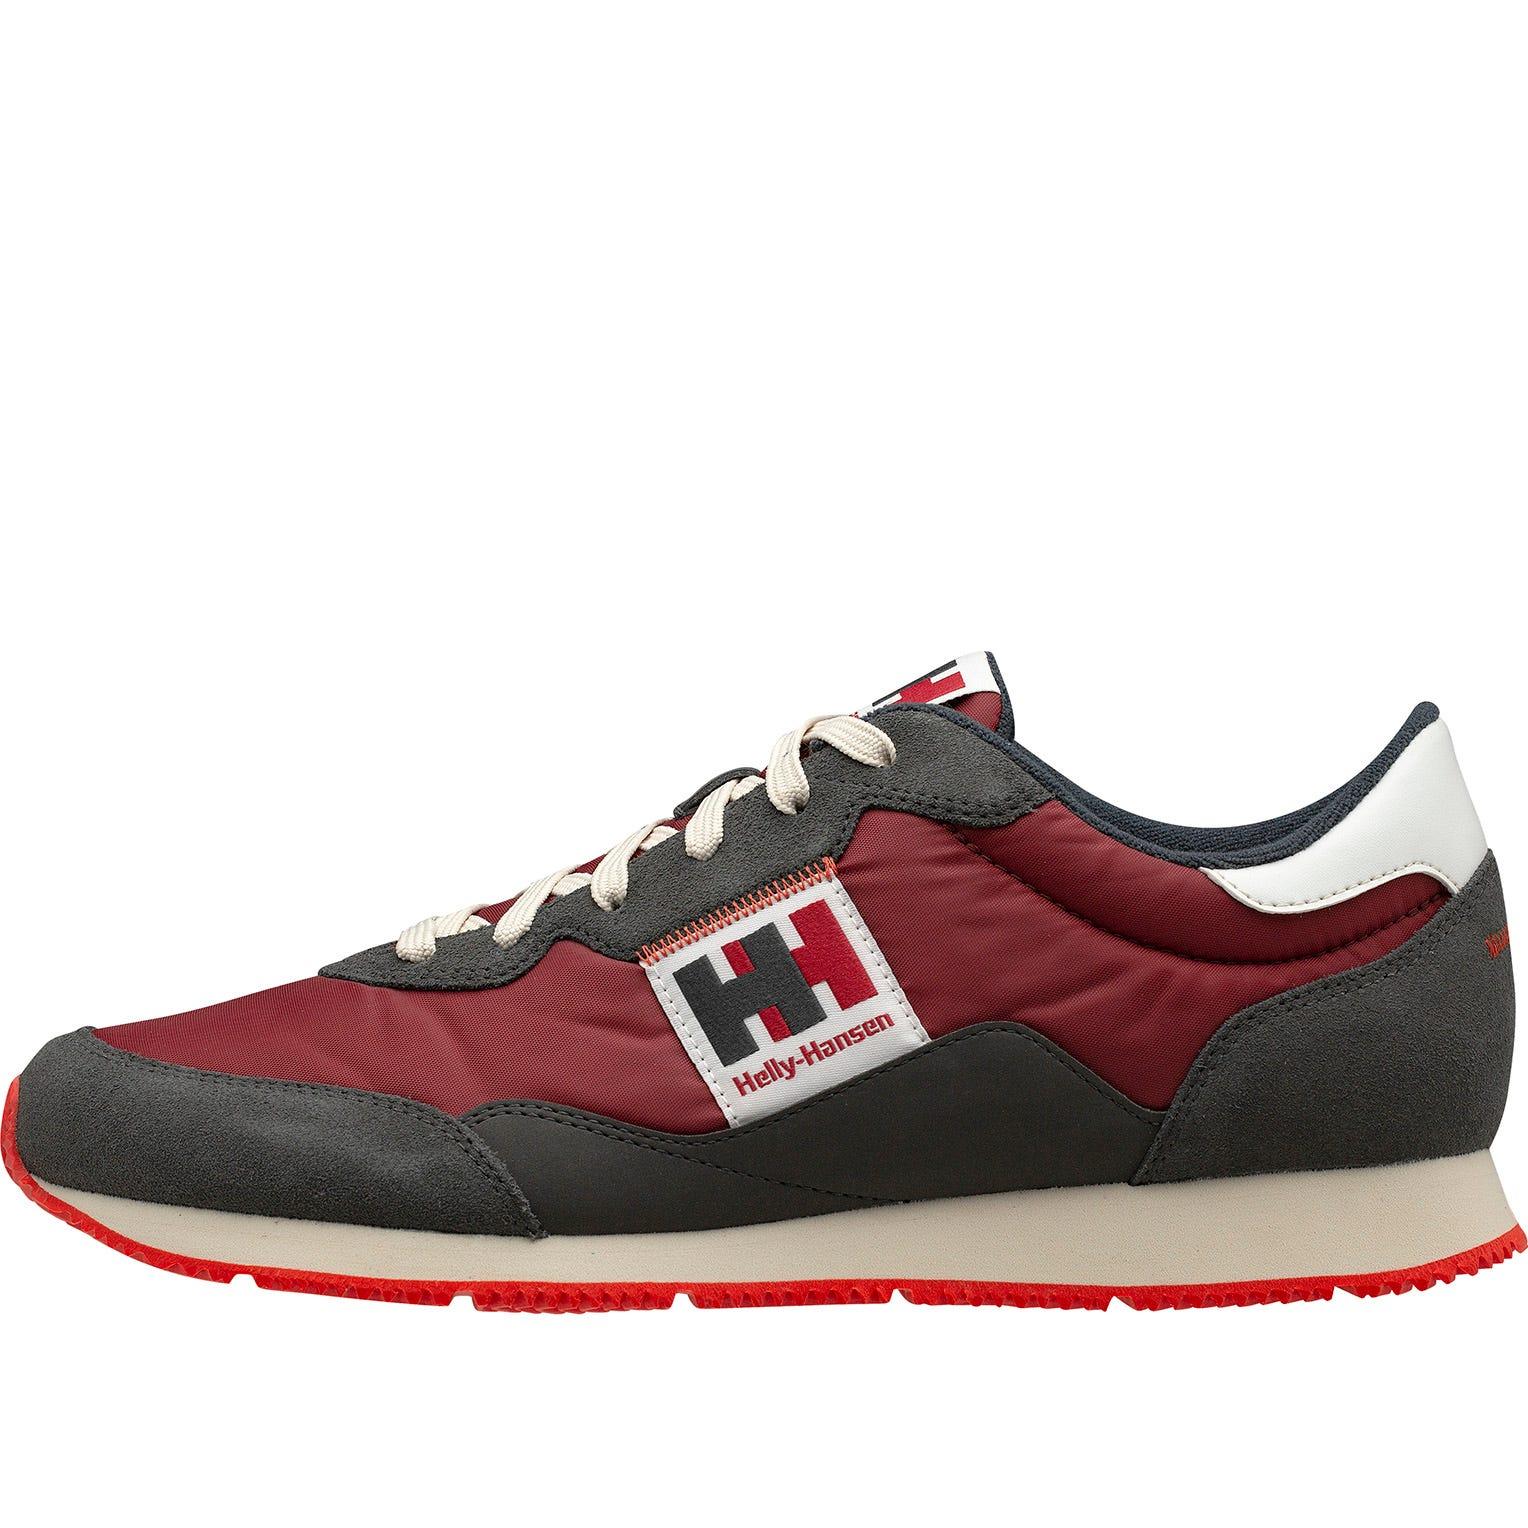 Helly Hansen Homme Chaussure Rouge 9